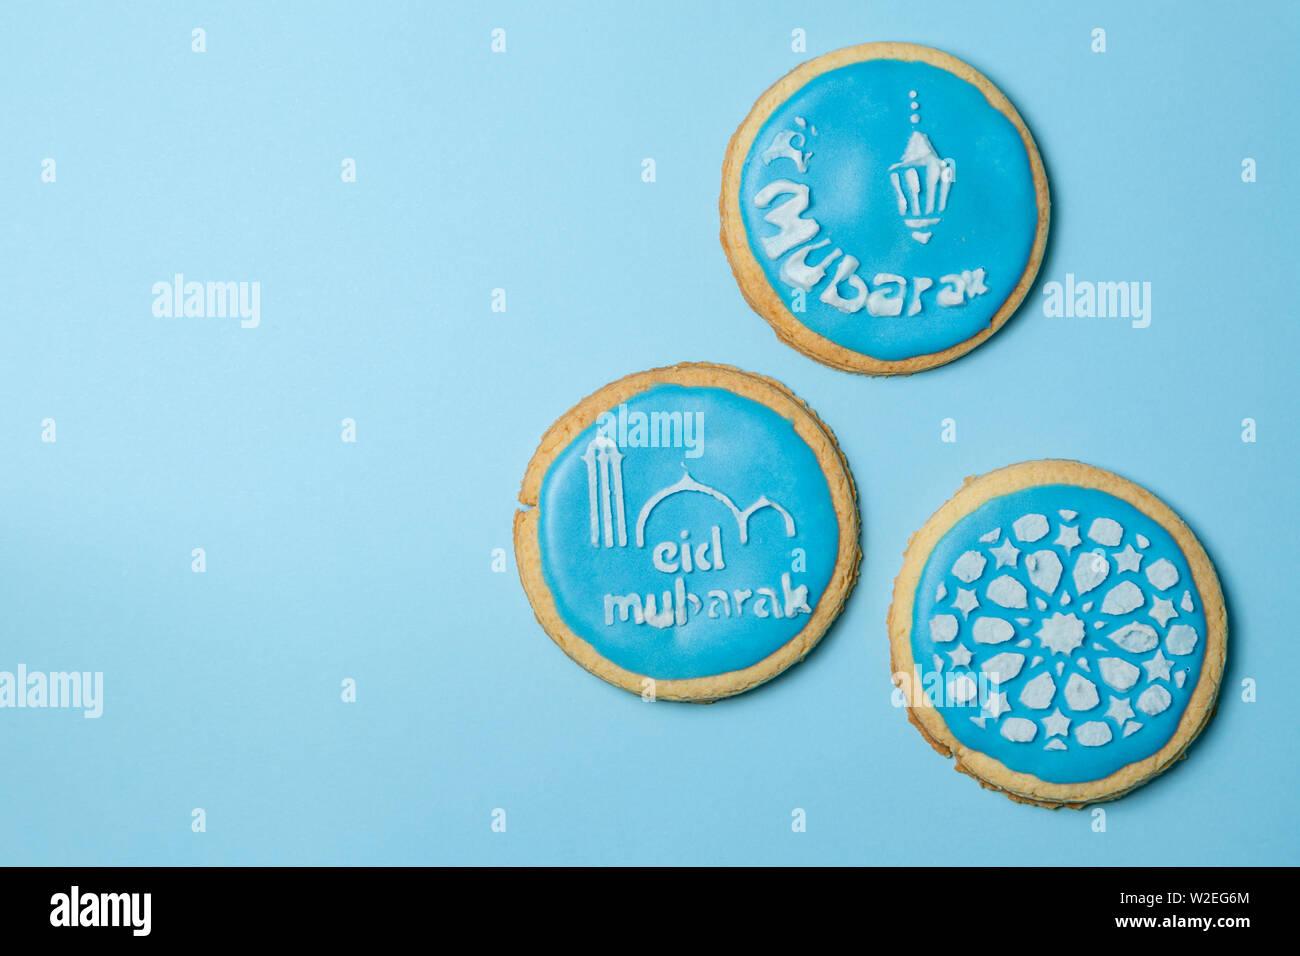 Eid Al Adha Mubarak Stock Photos & Eid Al Adha Mubarak Stock Images